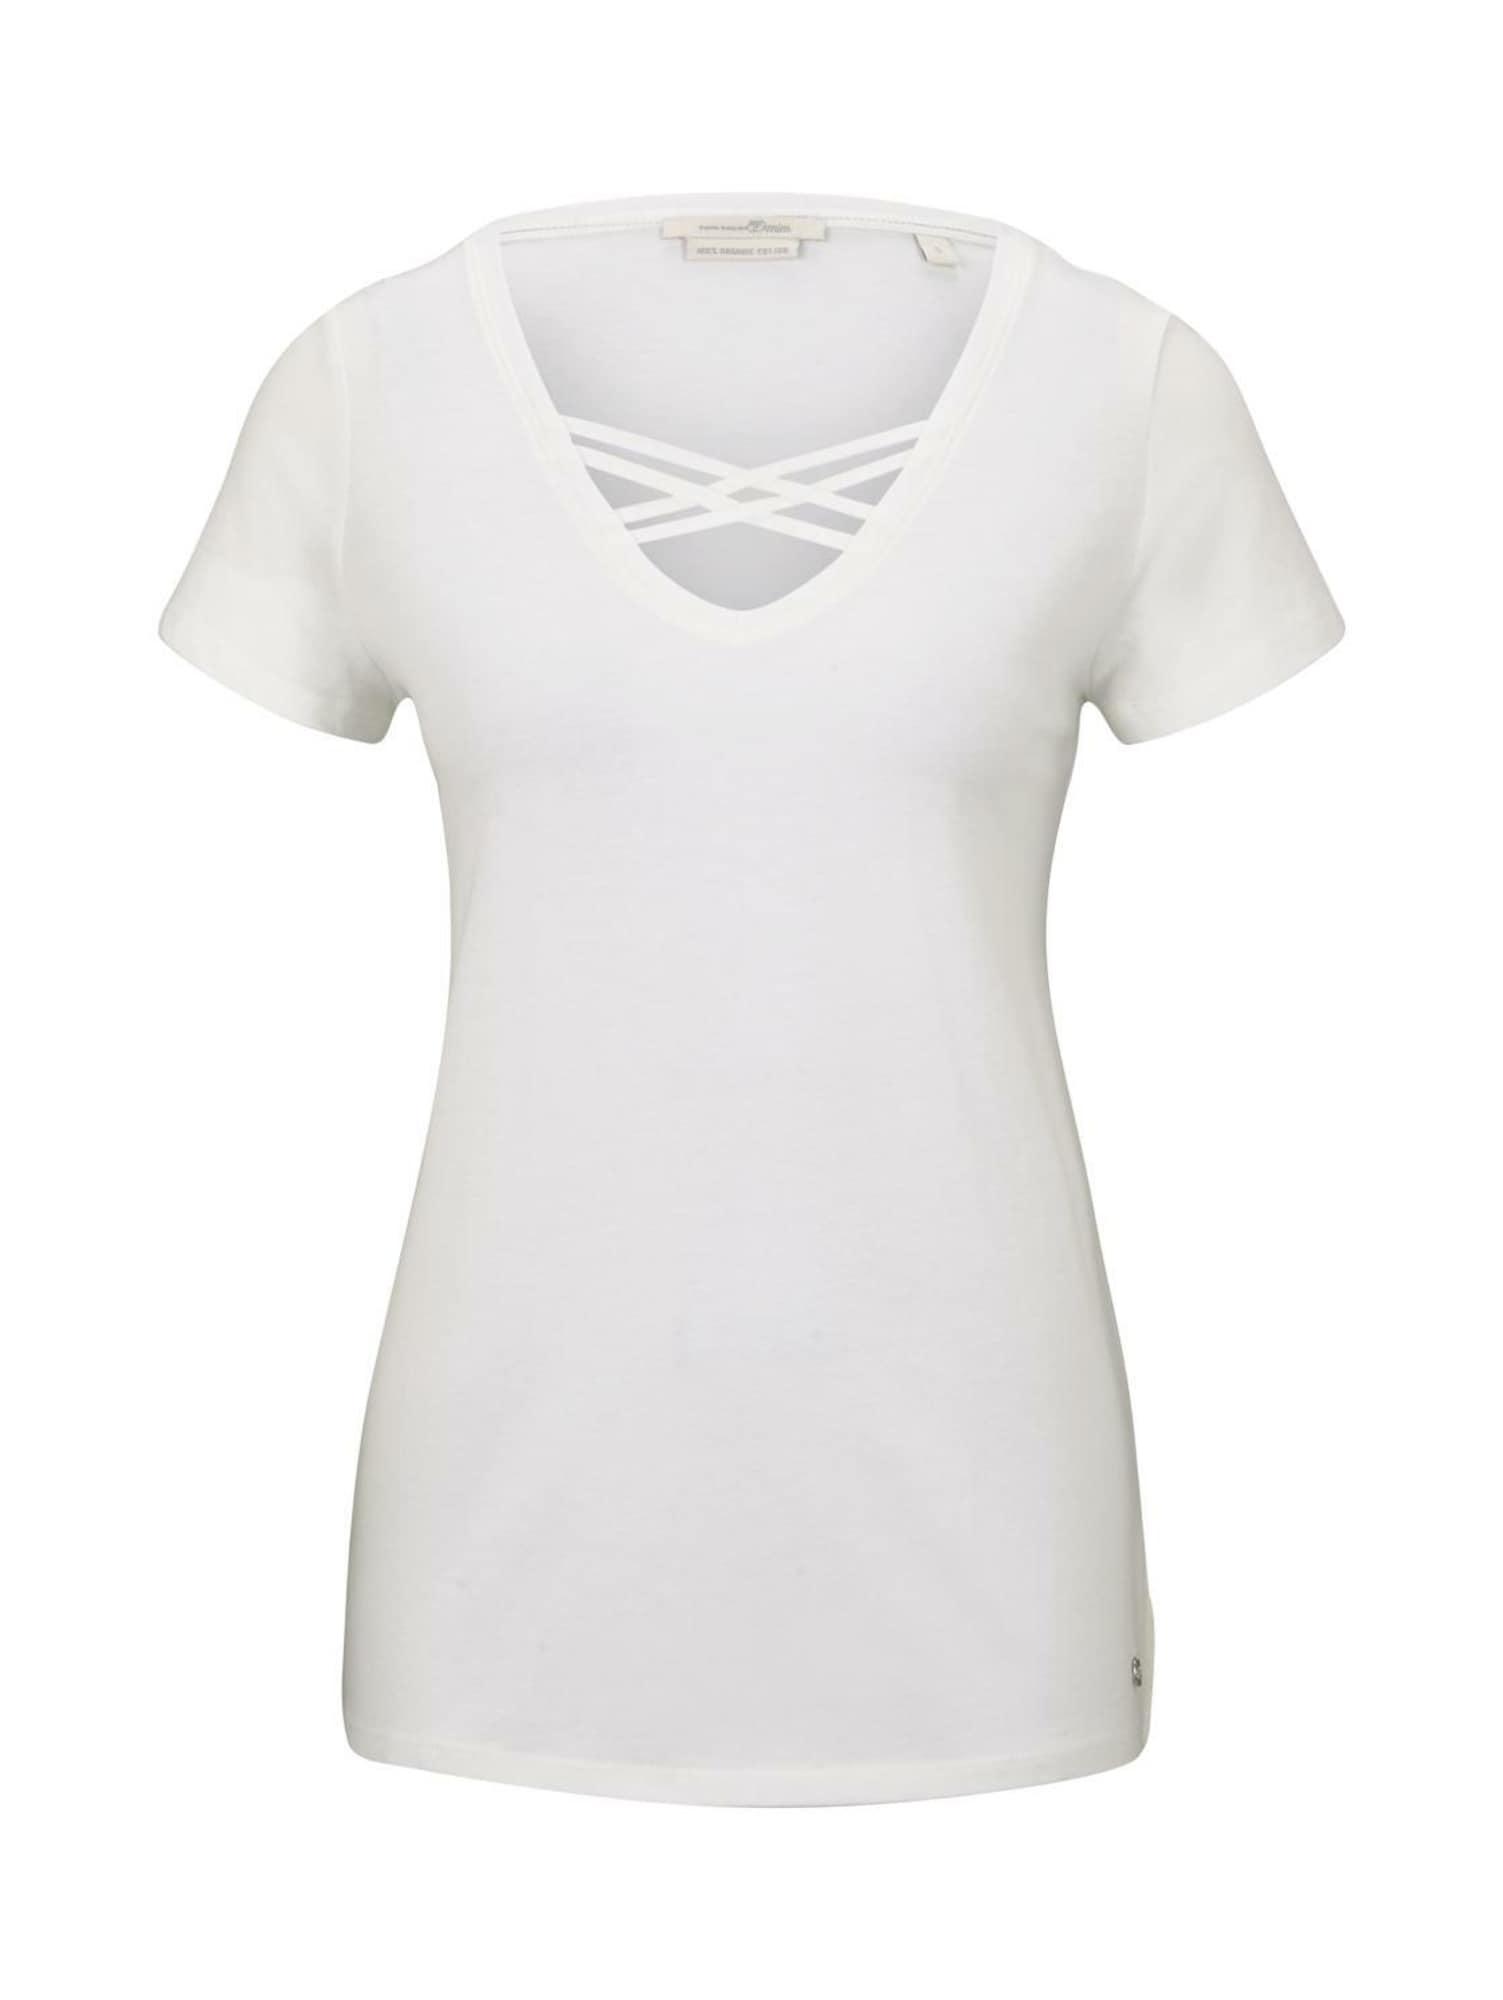 Shirt | Bekleidung > Shirts > Sonstige Shirts | Tom Tailor Denim